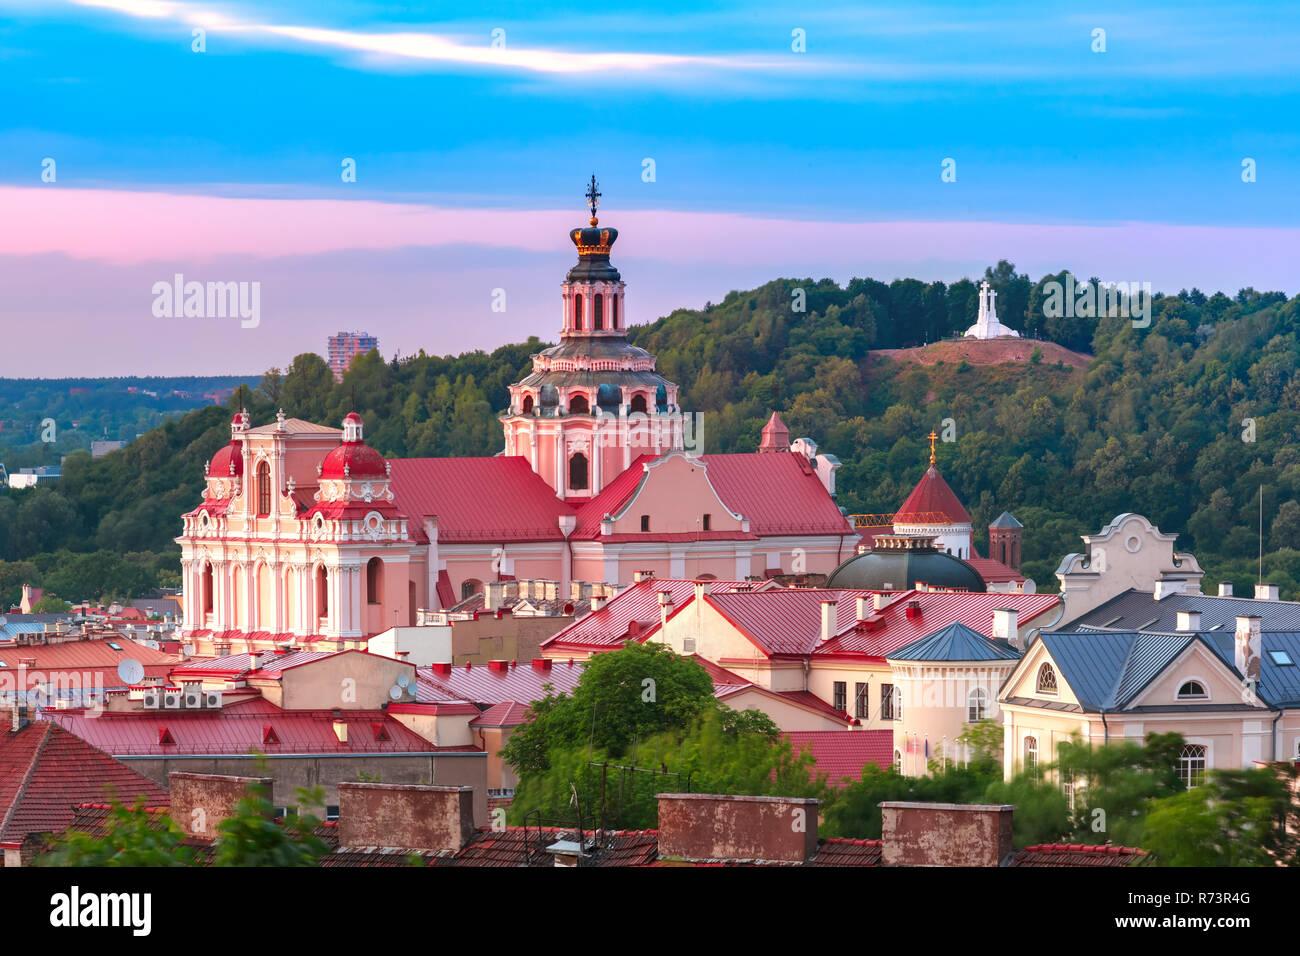 Al atardecer, la ciudad antigua de Vilnius, Lituania Foto de stock